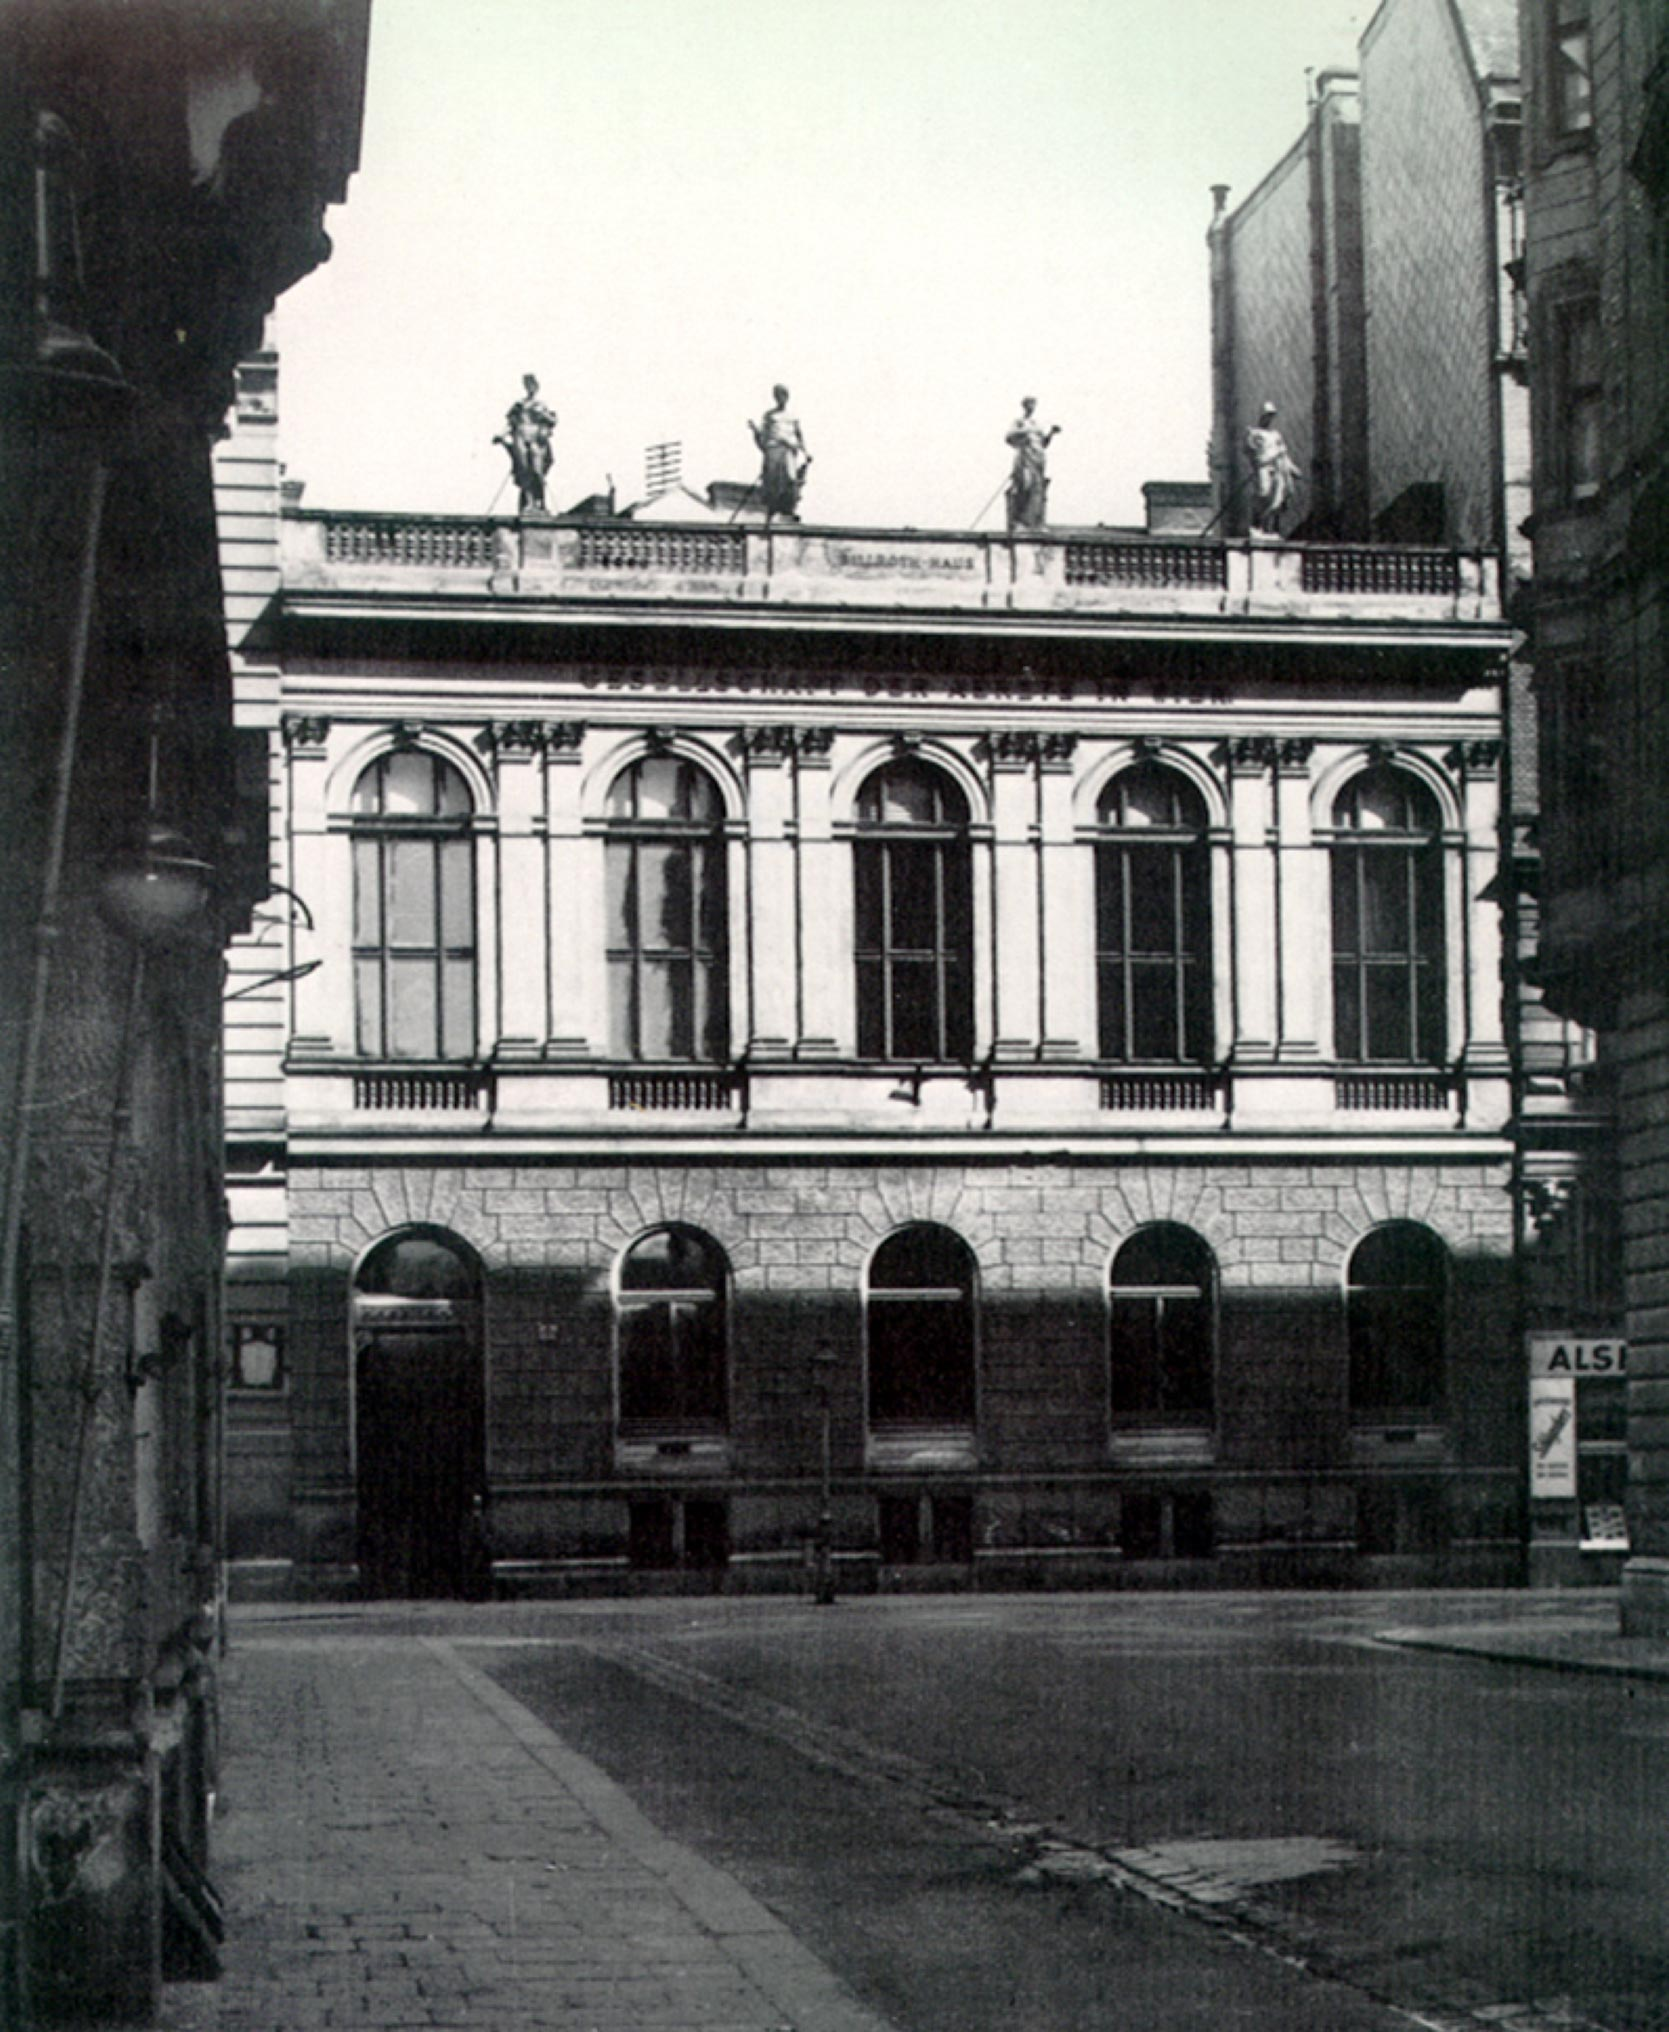 billrothhaus-geschichte-02-1894